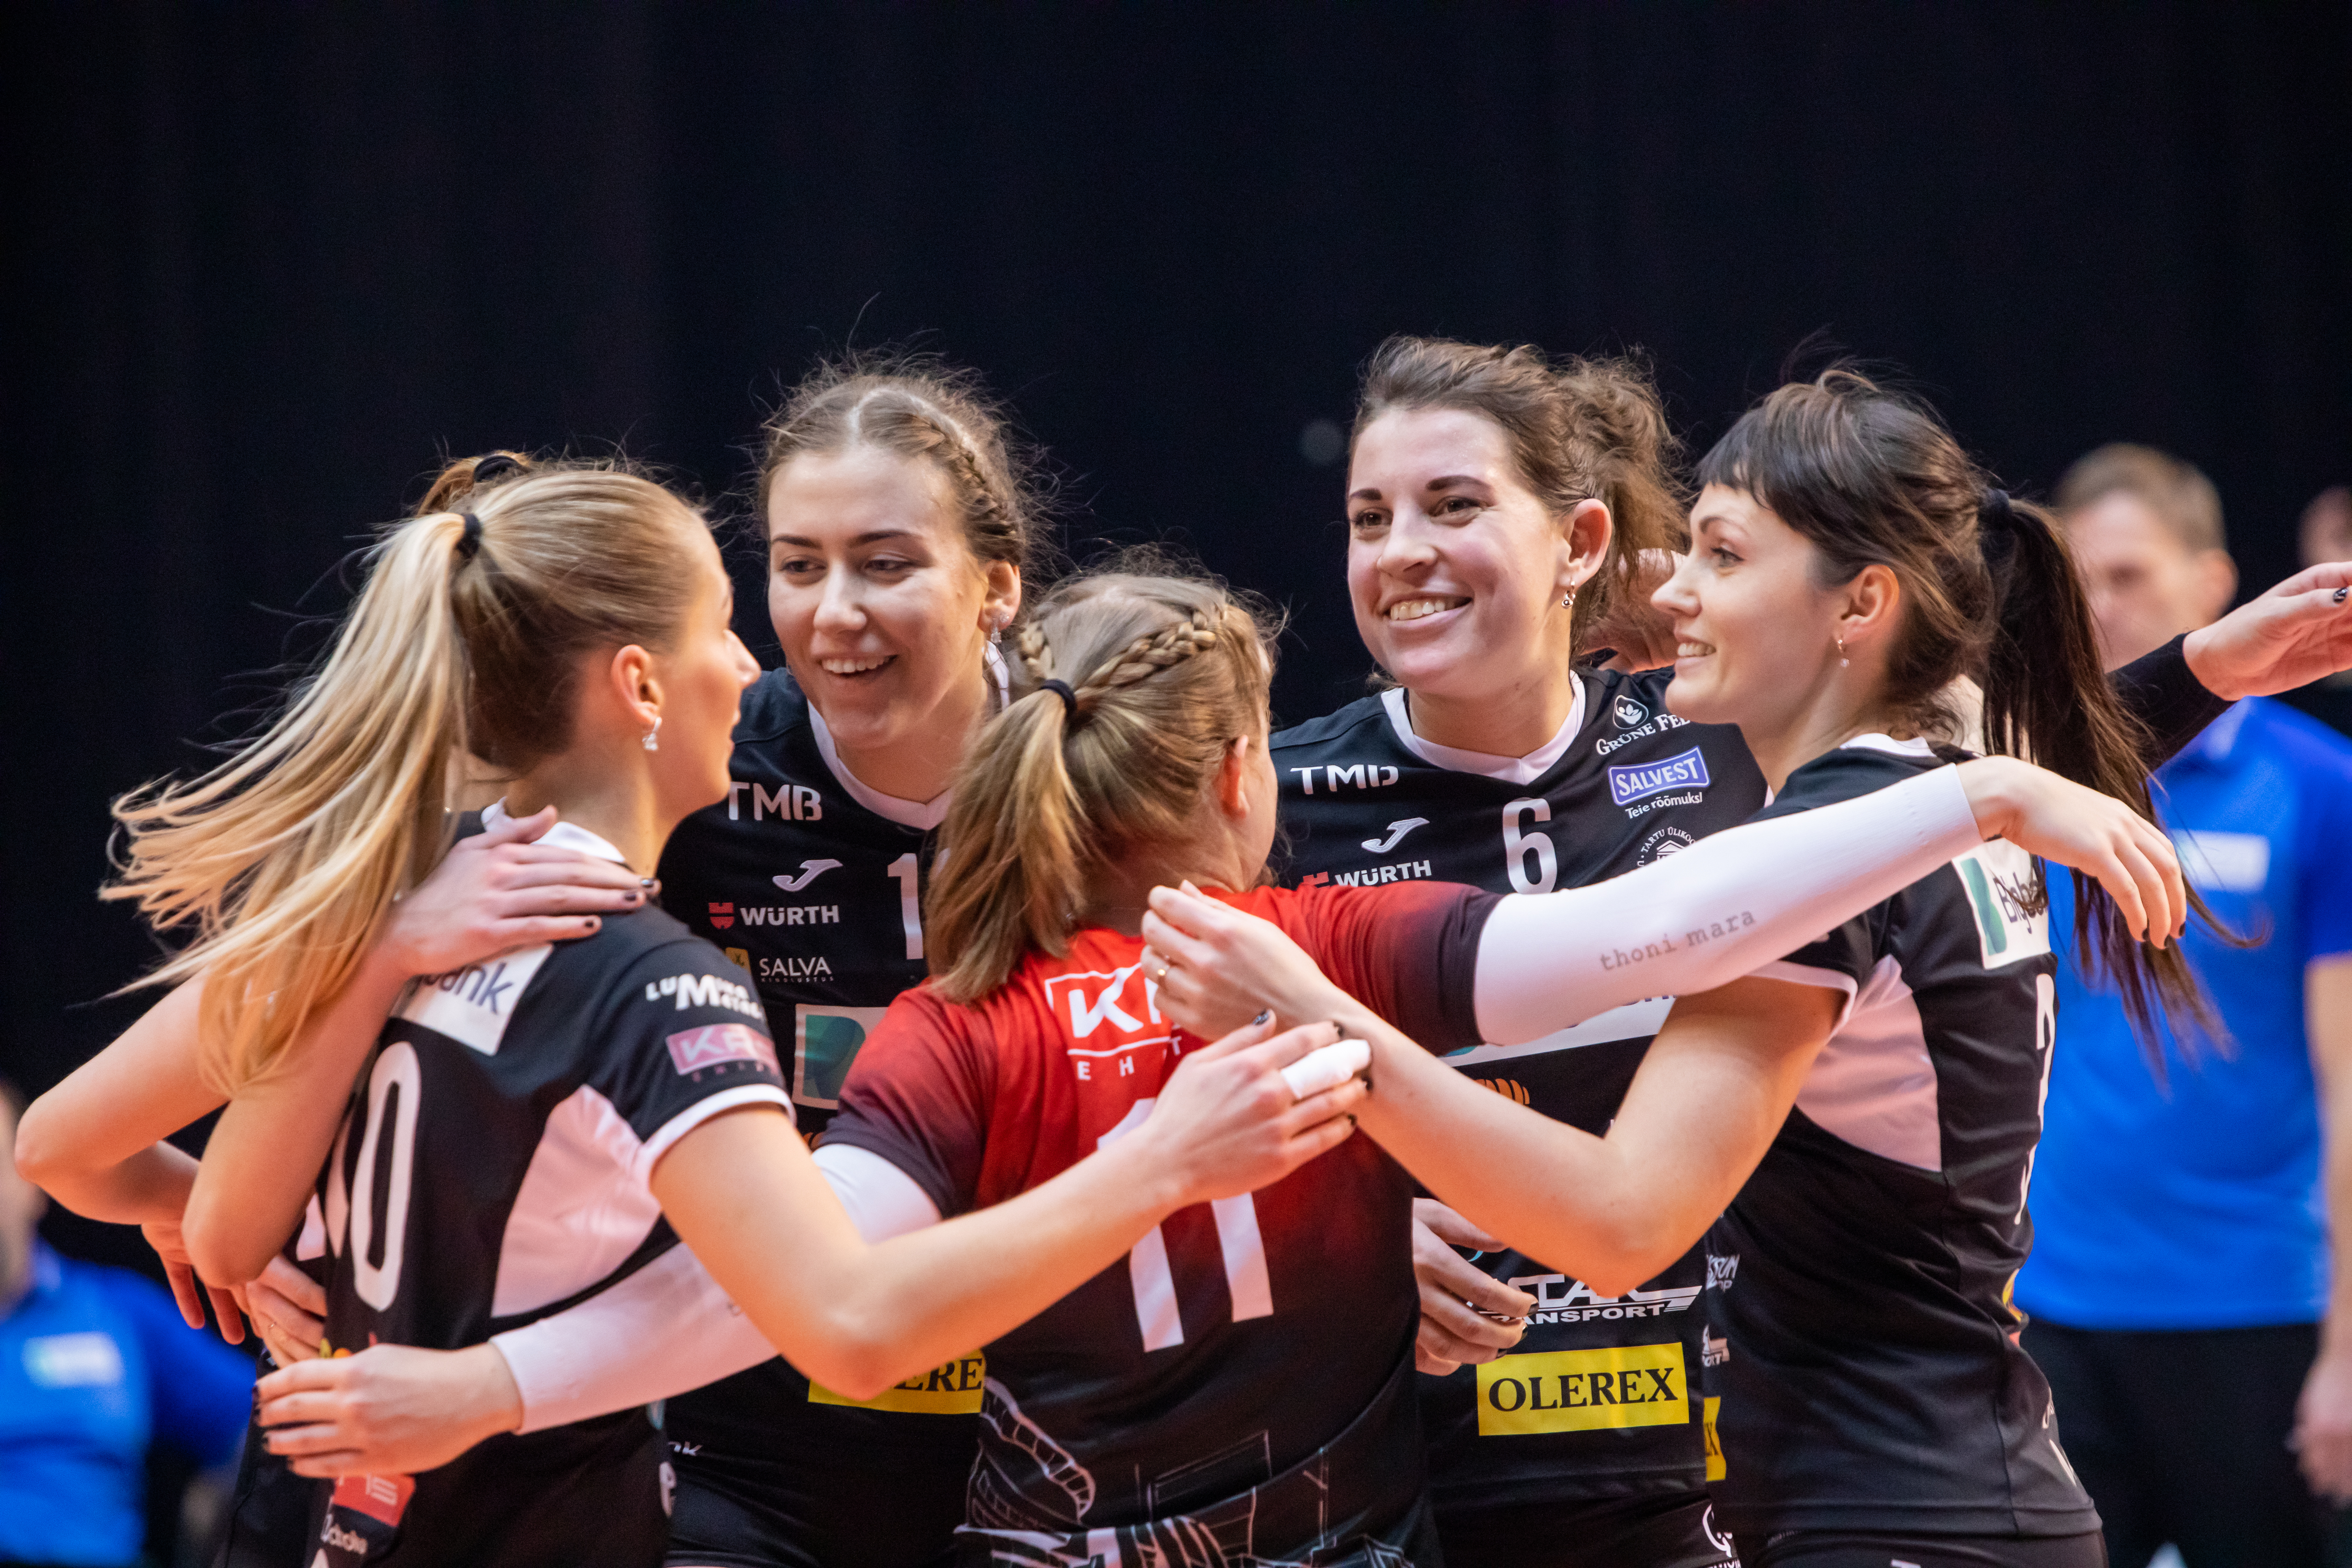 TÜ/Bigbank võitis Balti liigas pronksmedali!